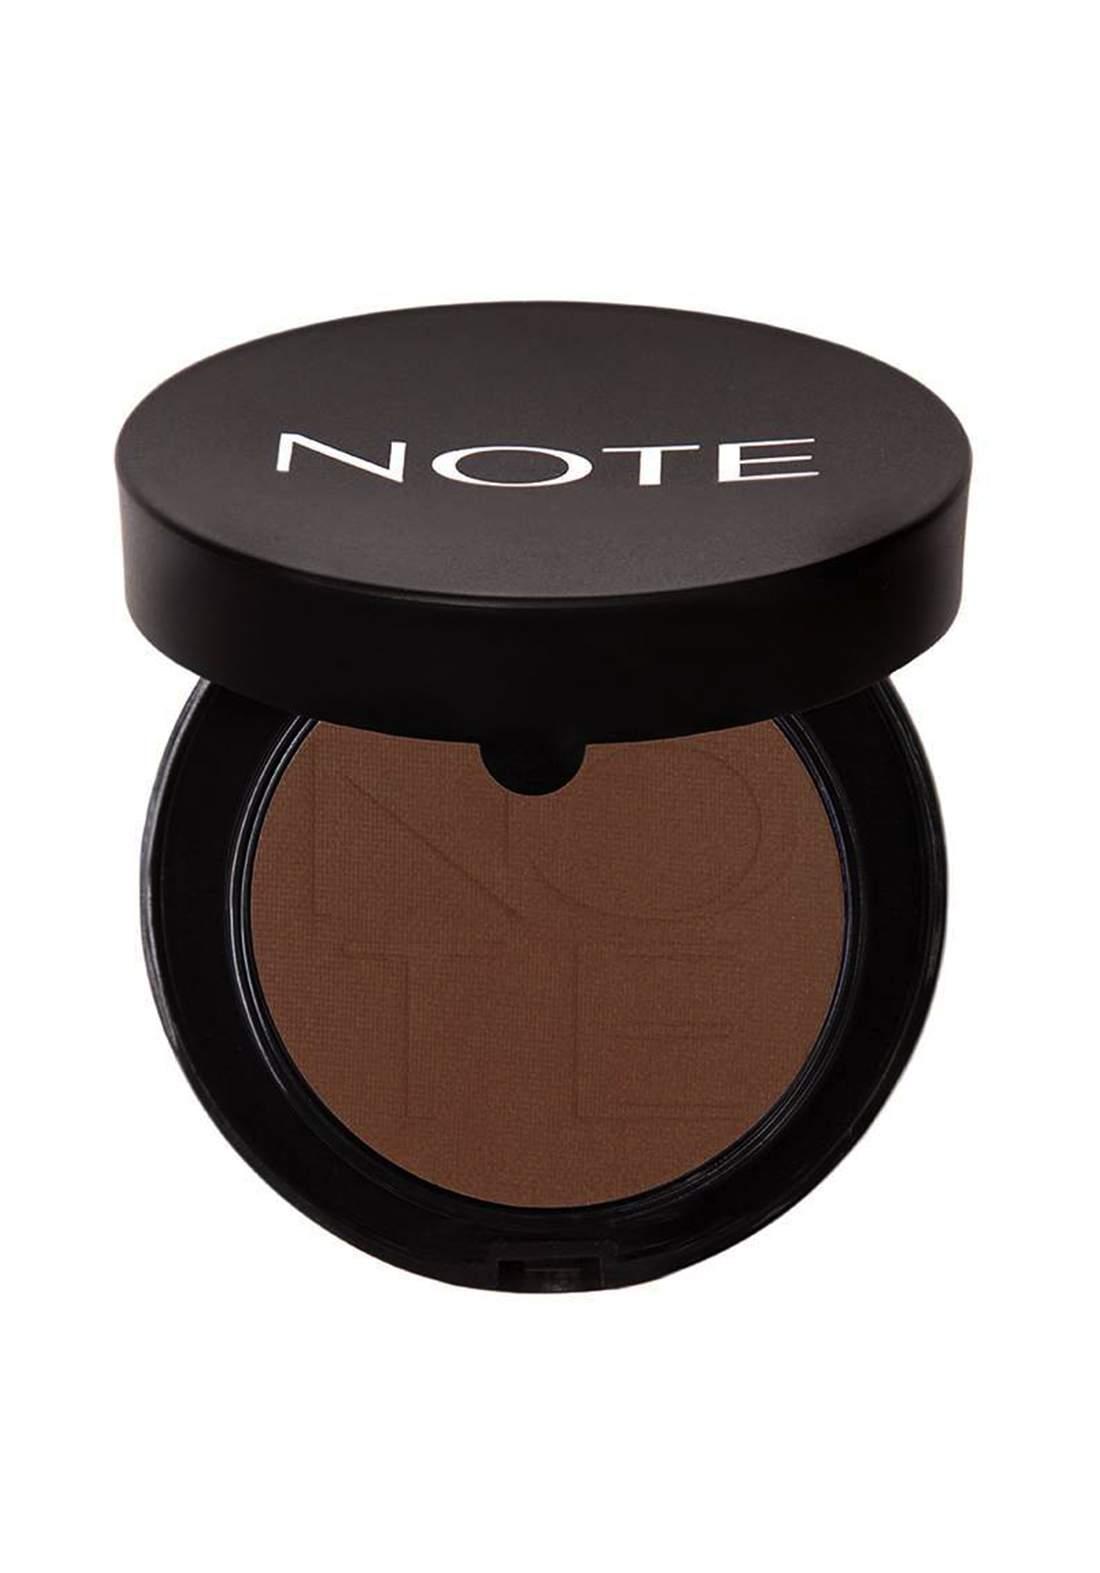 Note Luminous Silk Mono Eyeshadow No.08 ظلال للعيون